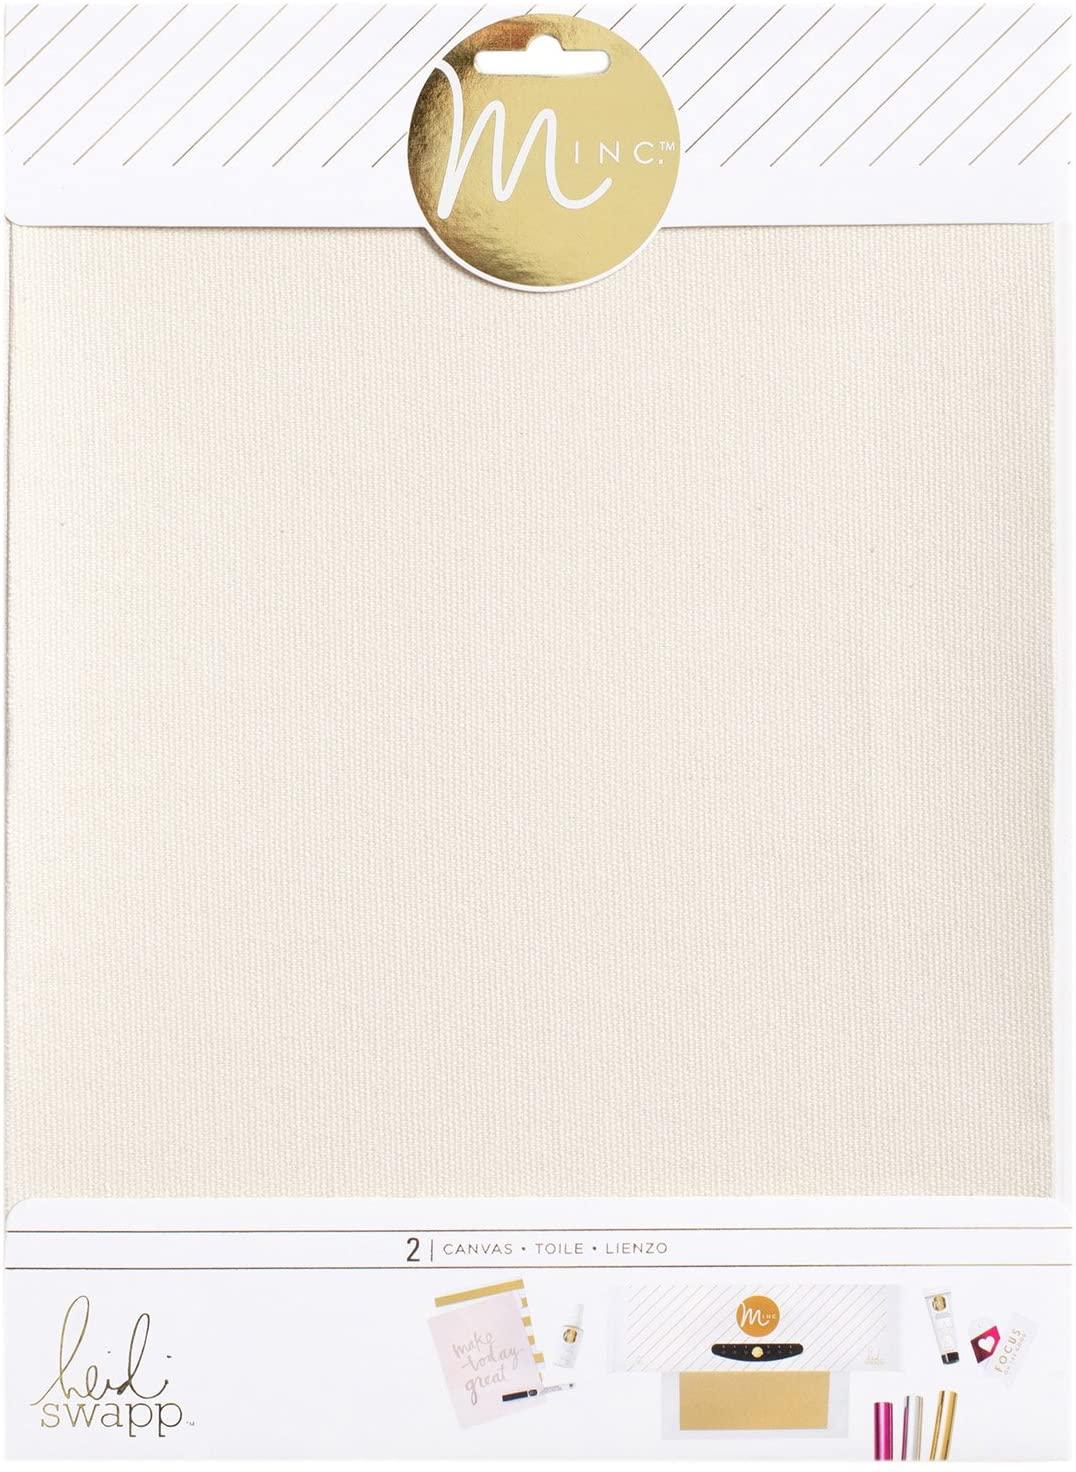 American Crafts Heidi Swapp Minc Substrara Adhesive Canvas 6 Piece